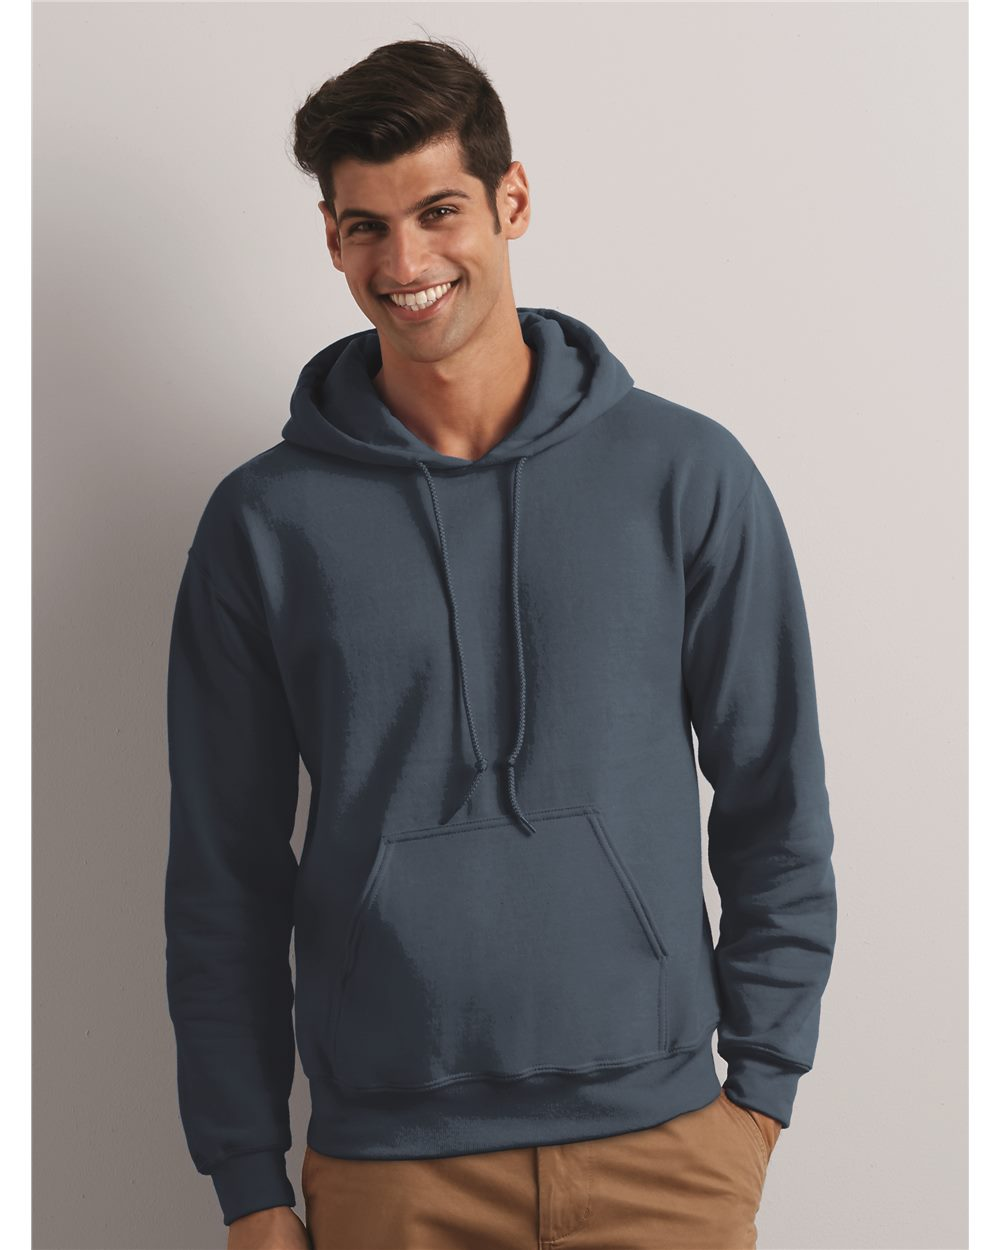 999883ff0 Gildan 18500 - Heavy Blend Hooded Sweatshirt - Friendly Arctic Printing